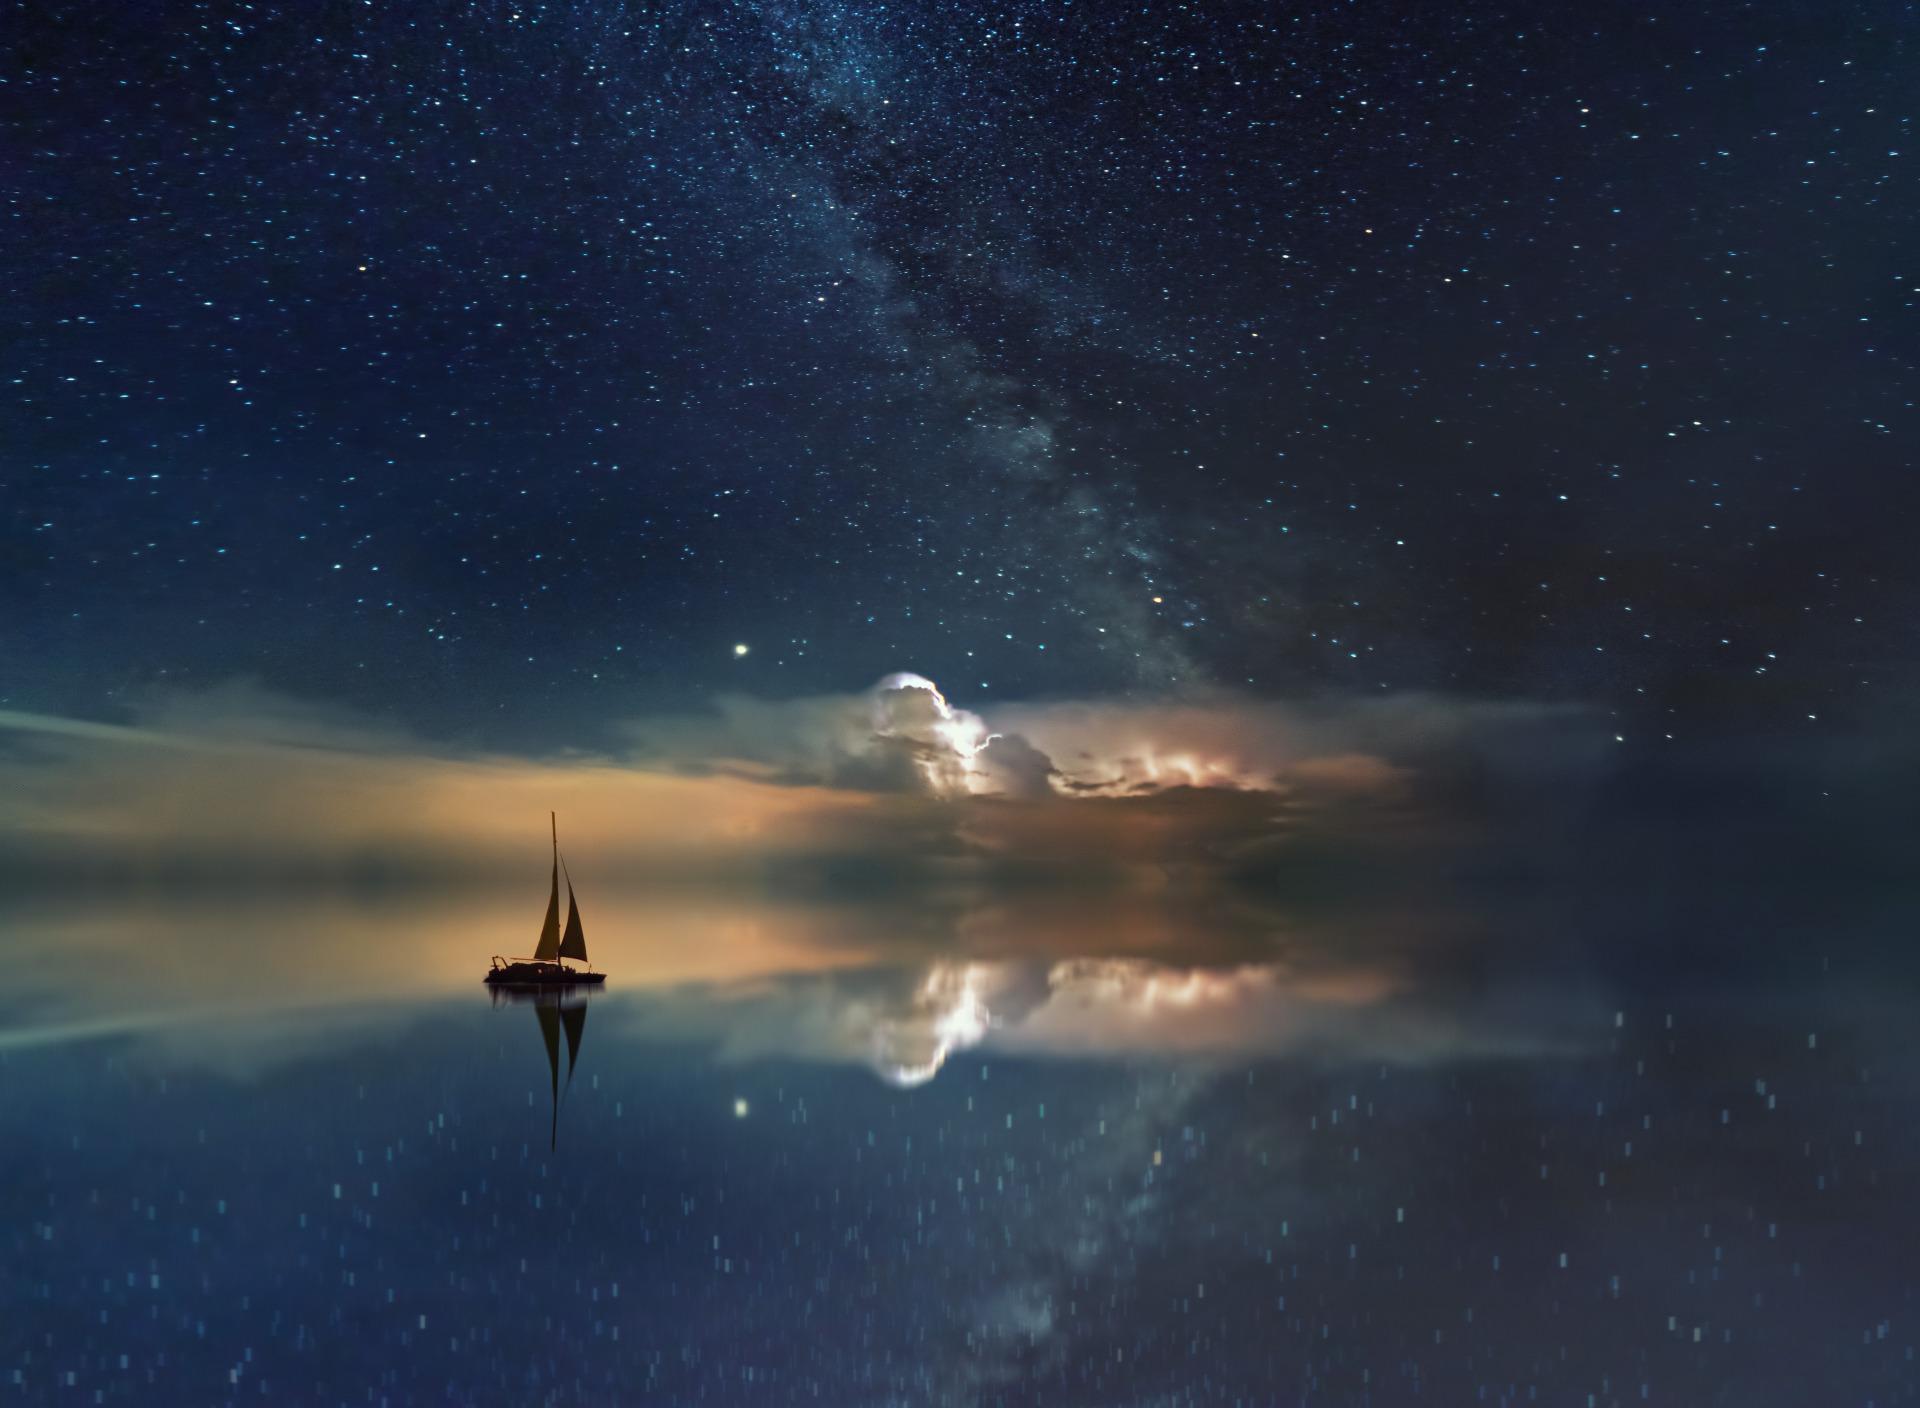 лесу открытки ночное небо приводит